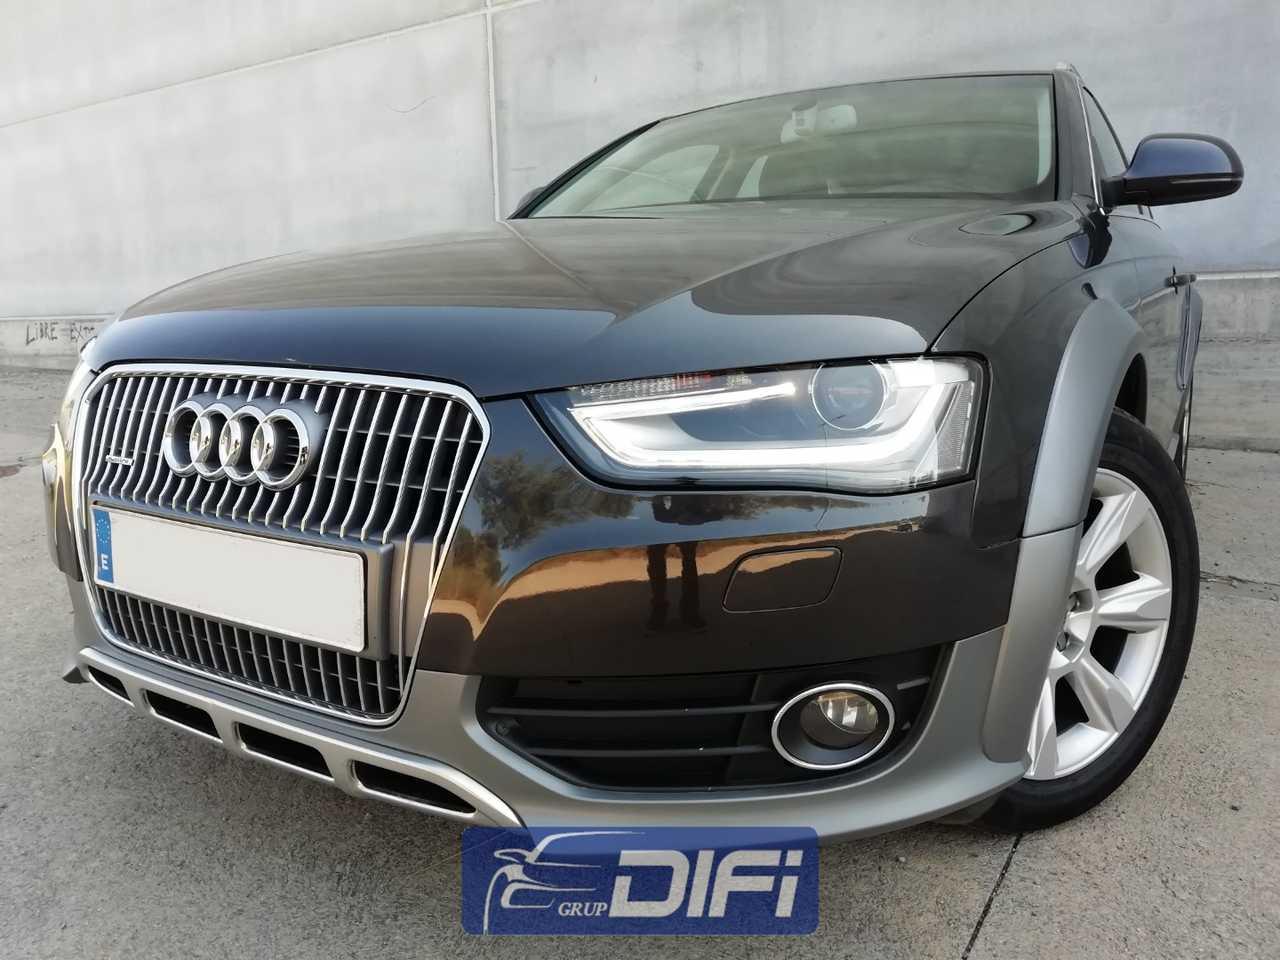 Audi A4  Allroad 2.0TDI QUATTRO 177cv 6vel   - Foto 1